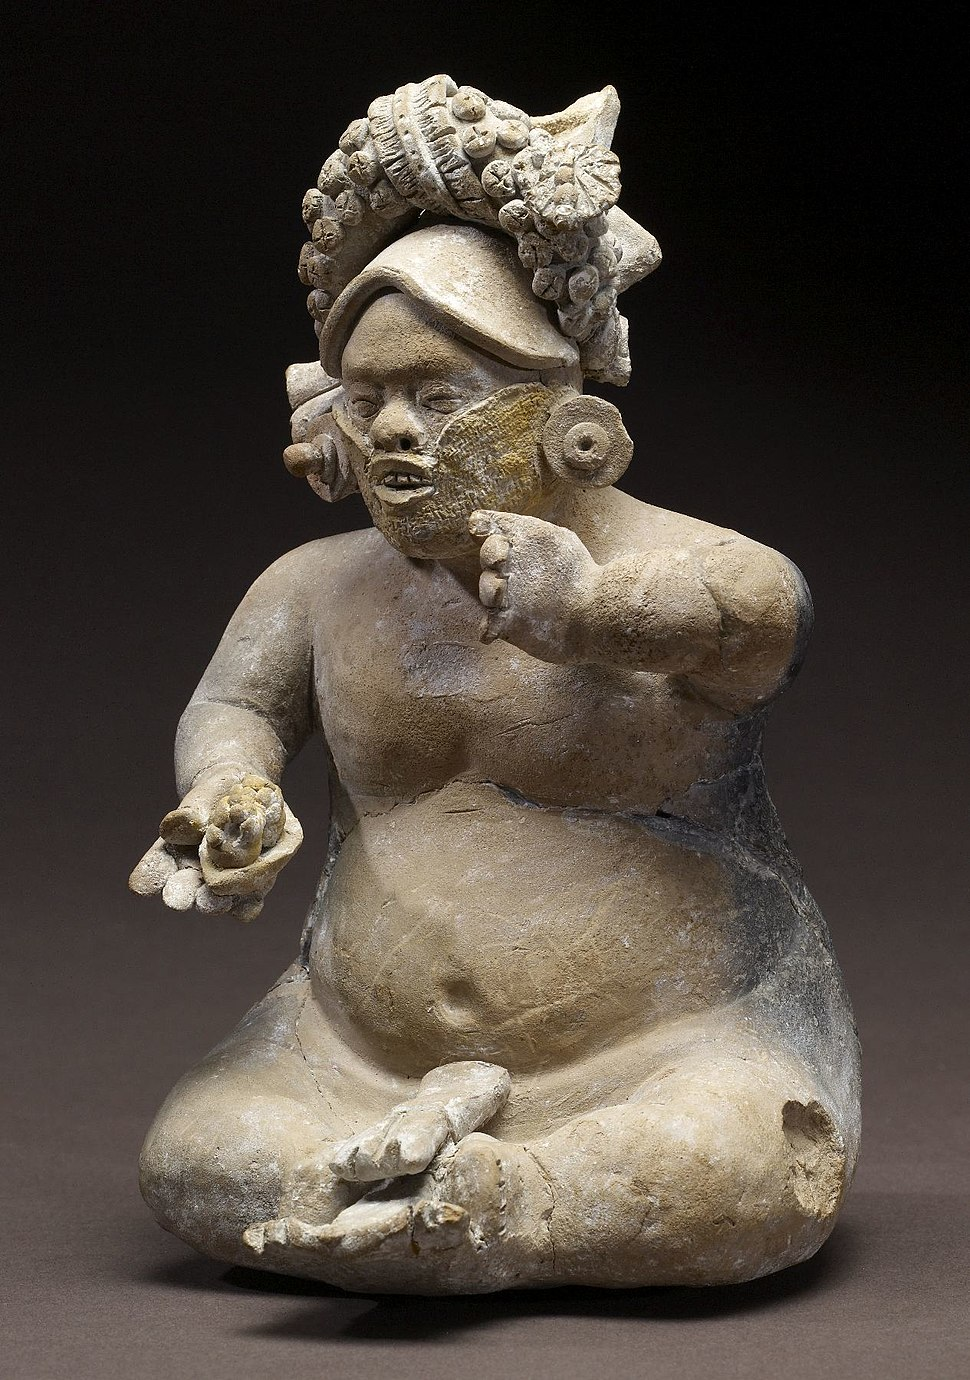 Mayan - Dwarf Figurine - Walters 20092036 - View A